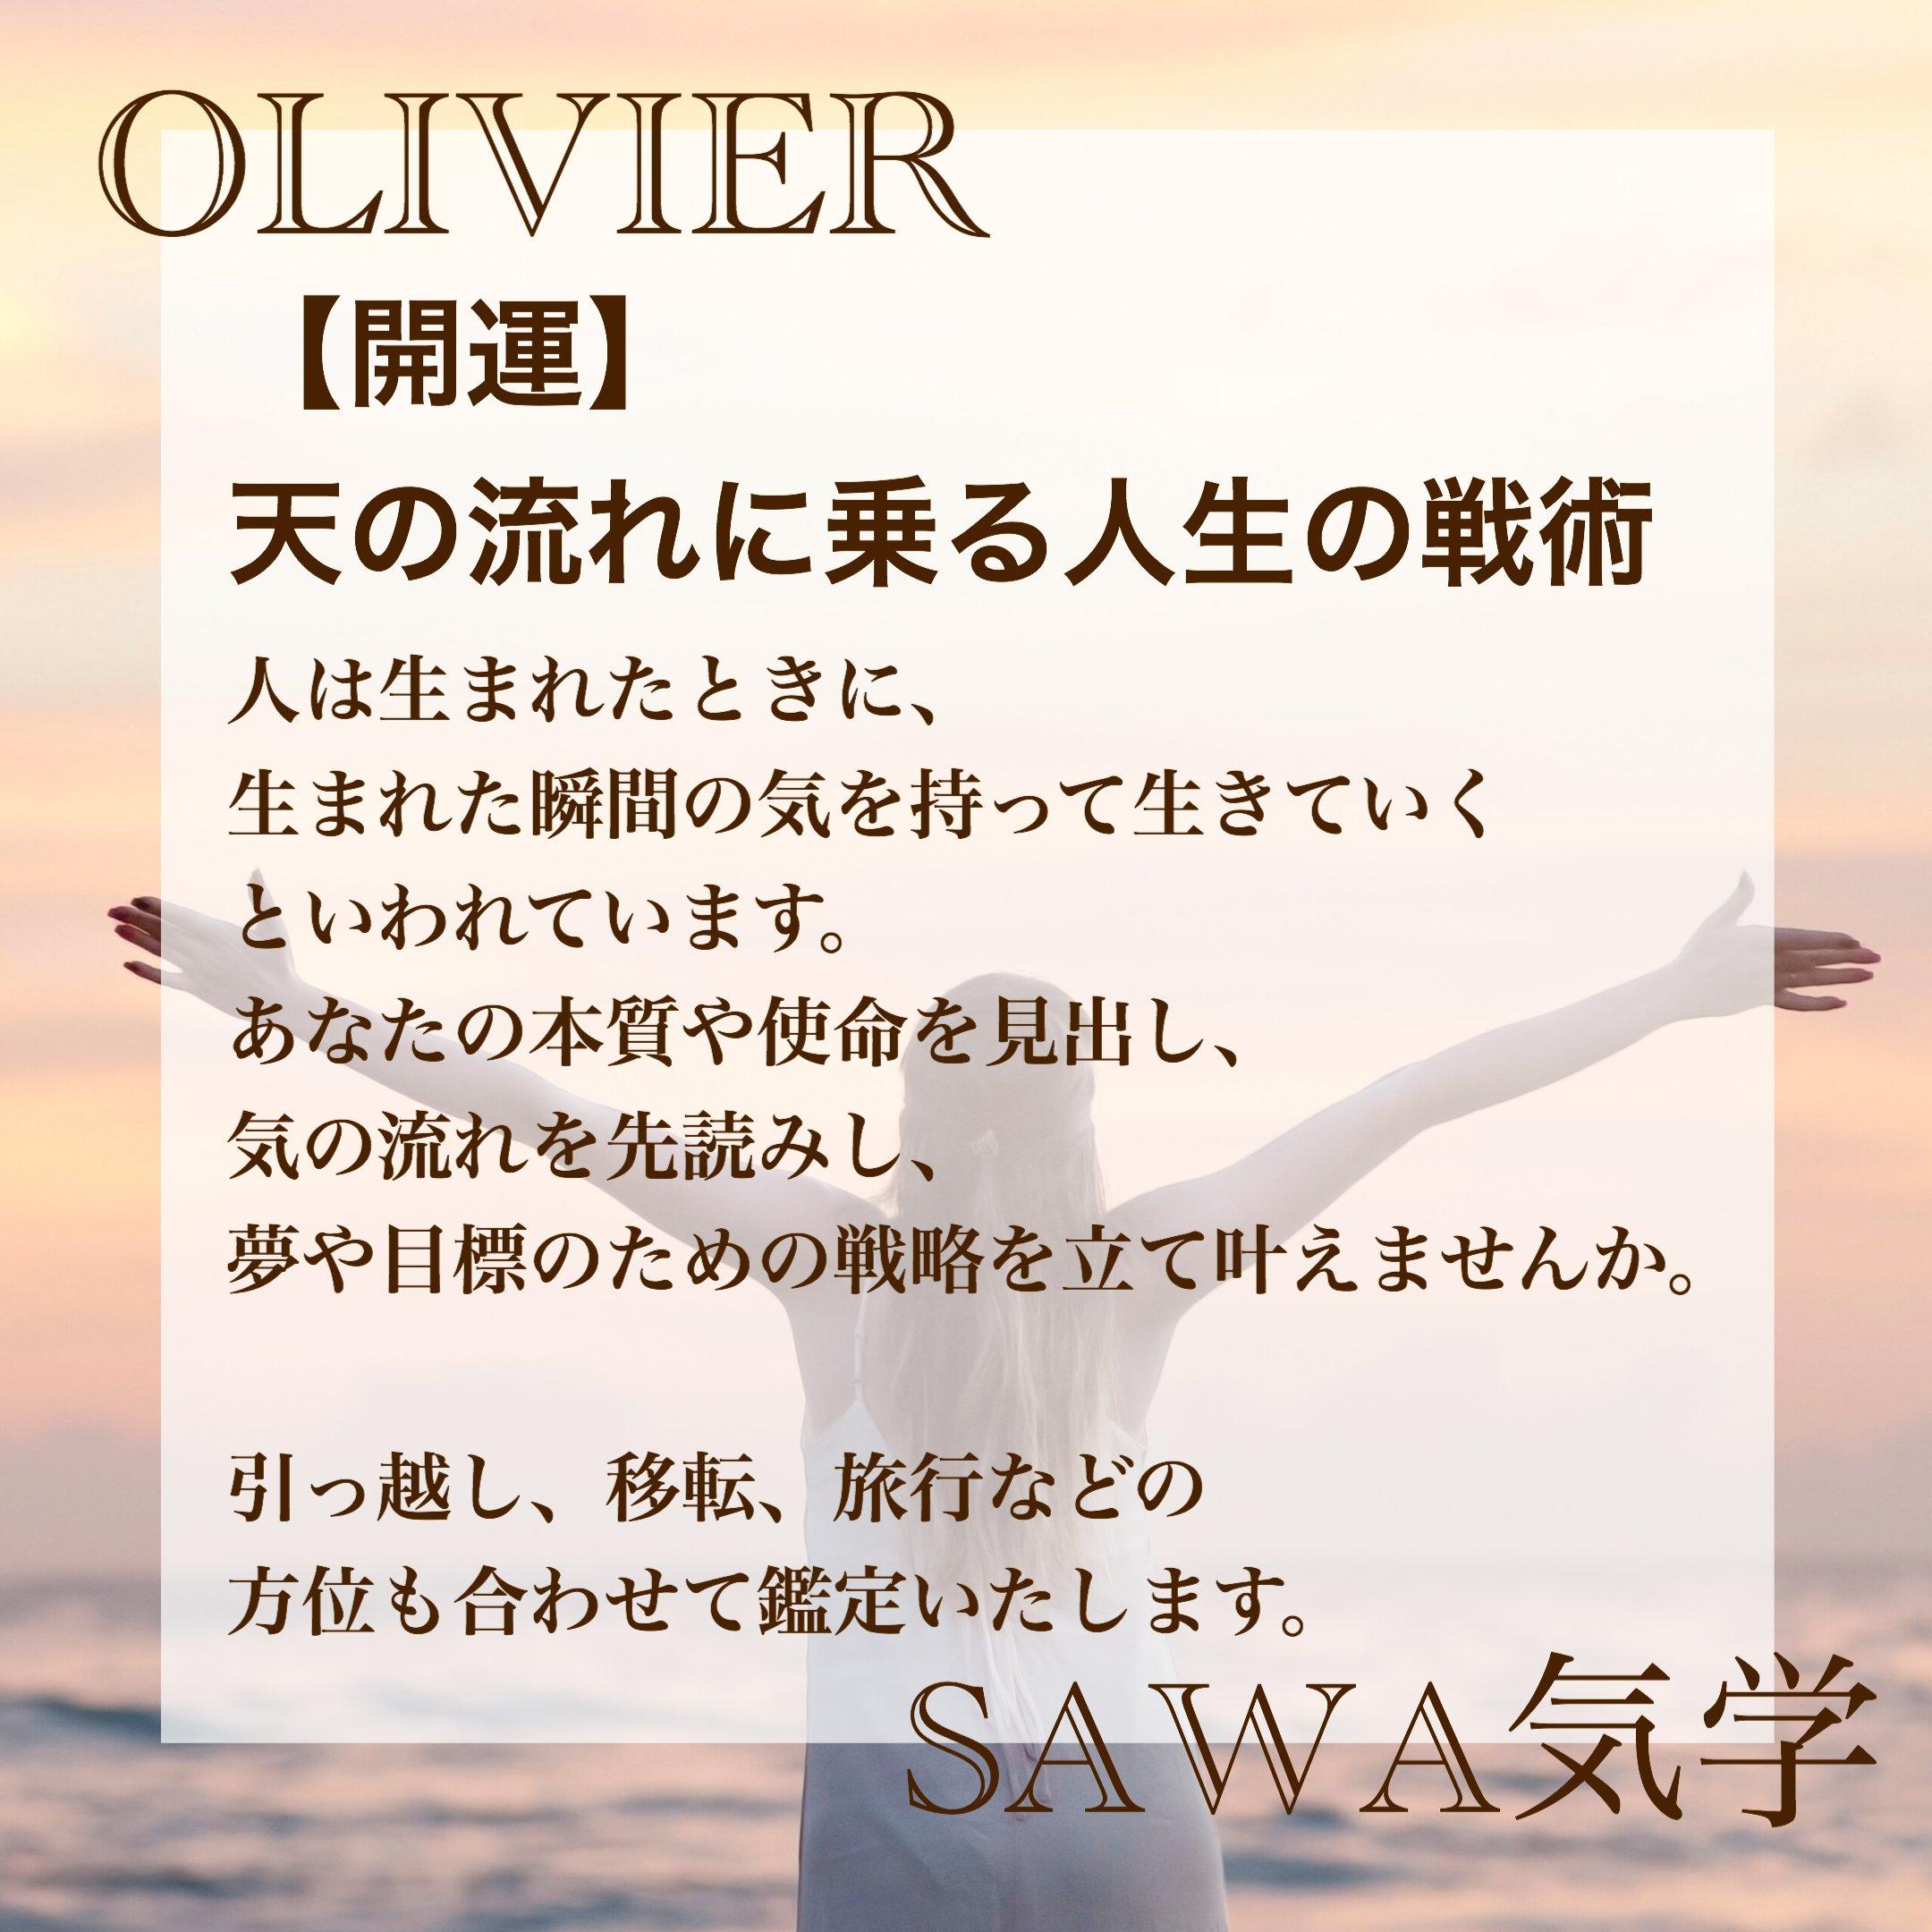 SAWA気学オンライン鑑定90分〜【開運】天の流れに乗る人生の戦術〜のイメージその2